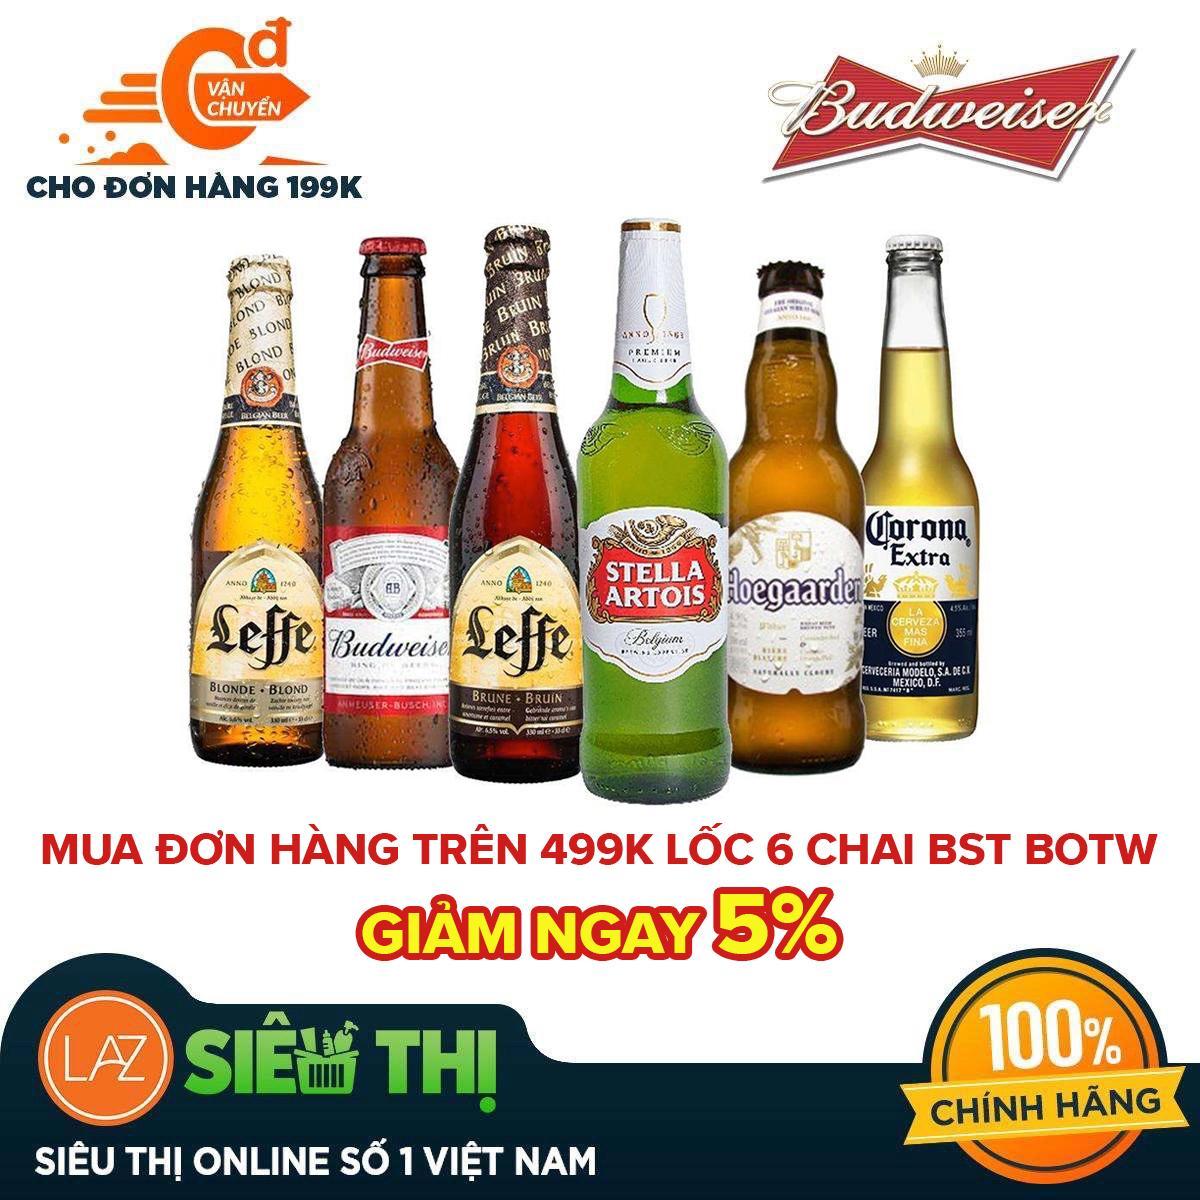 [Siêu thị Lazada] - Bộ sưu tập bia cao cấp Beers of the World 6 chai - Budweiser, Leffe Blonde,...